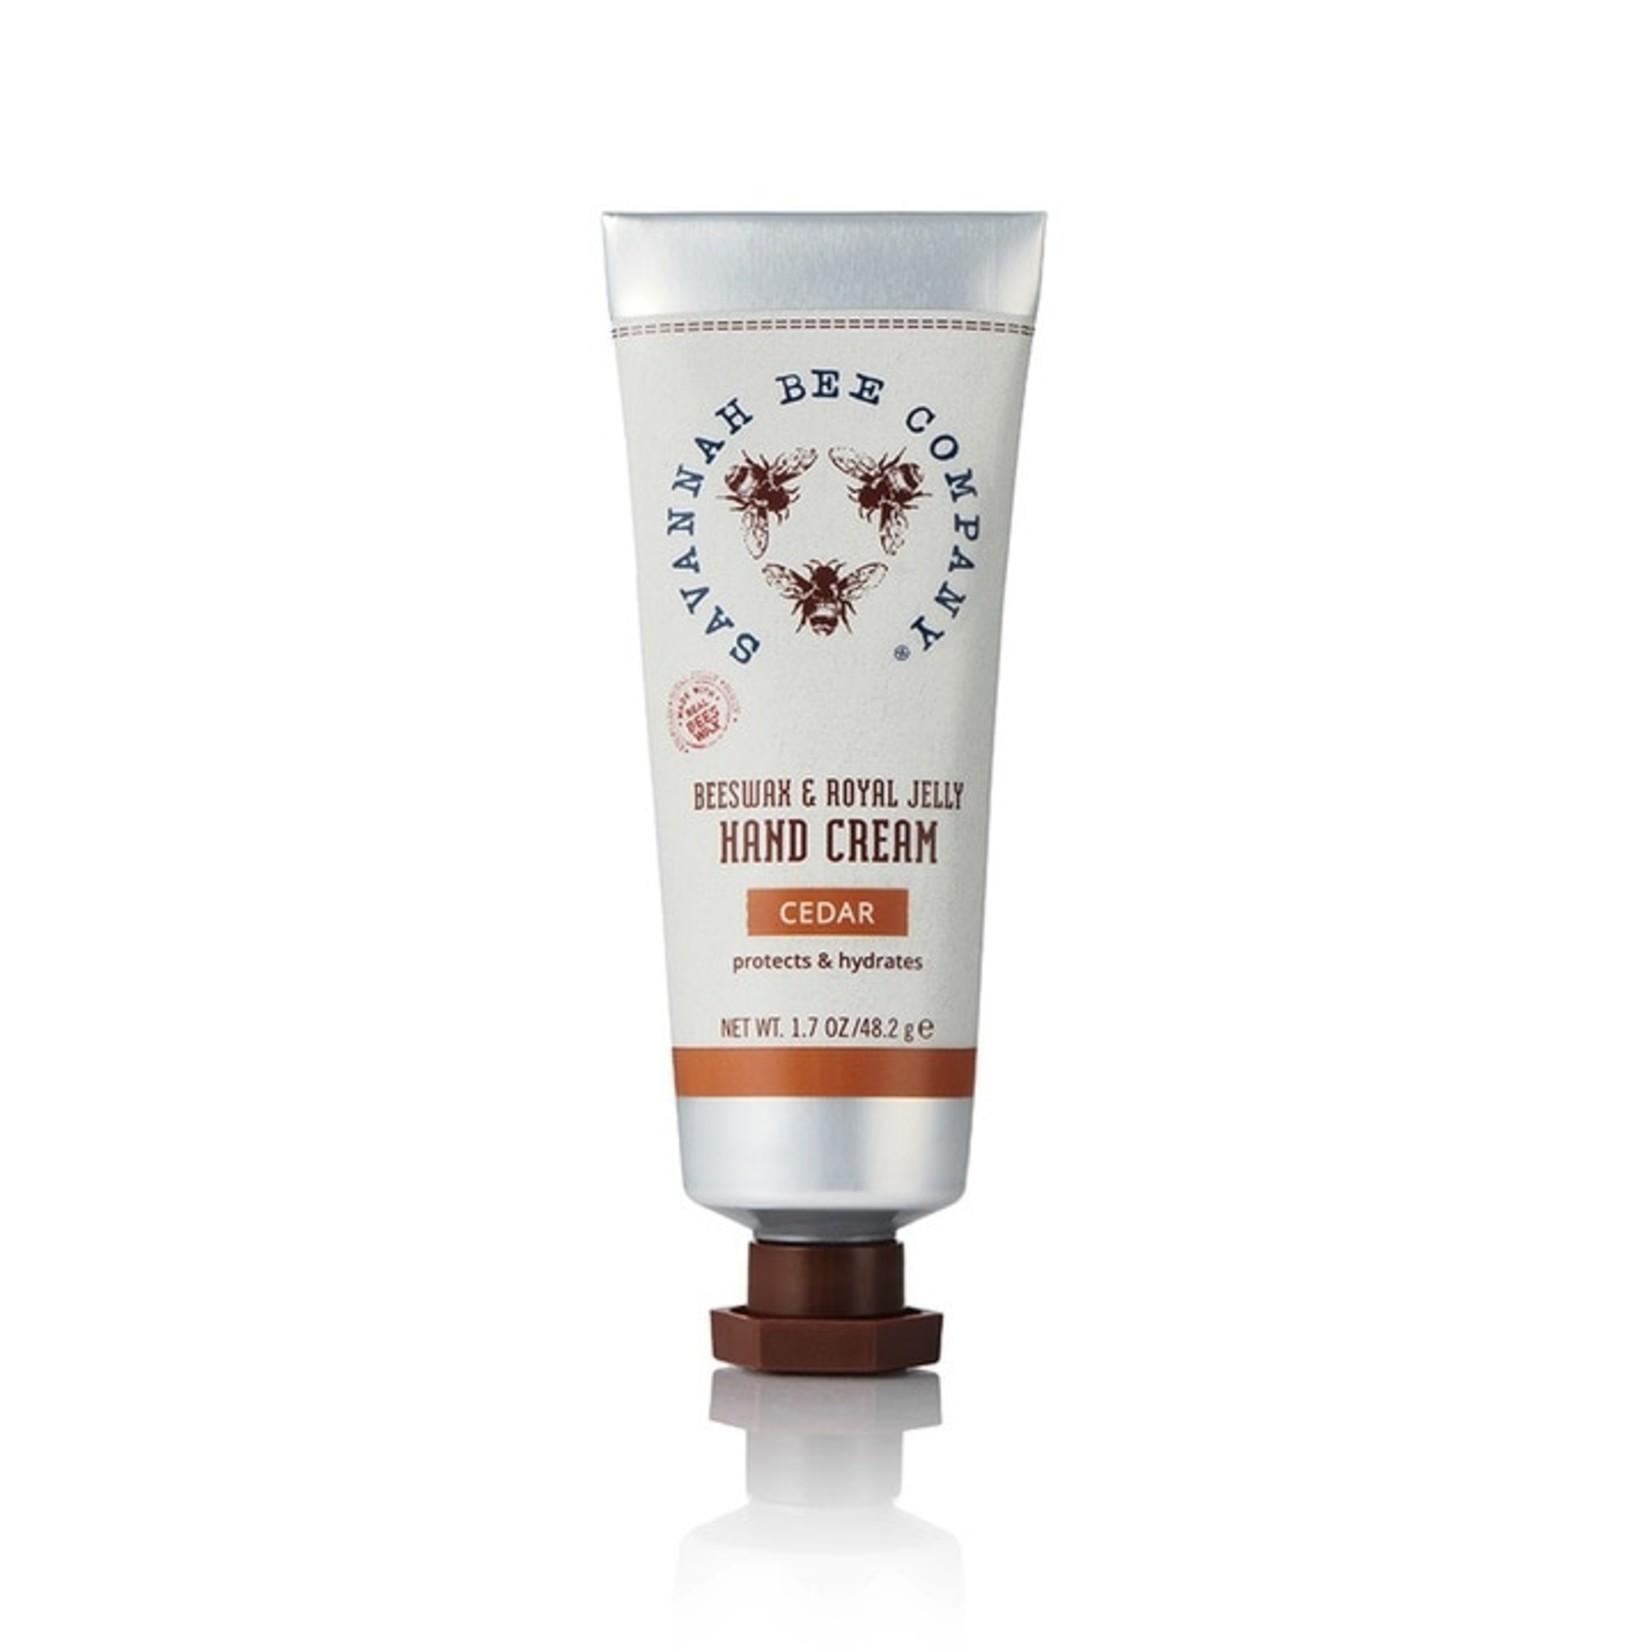 Savannah Bee Company Beeswax Hand Cream